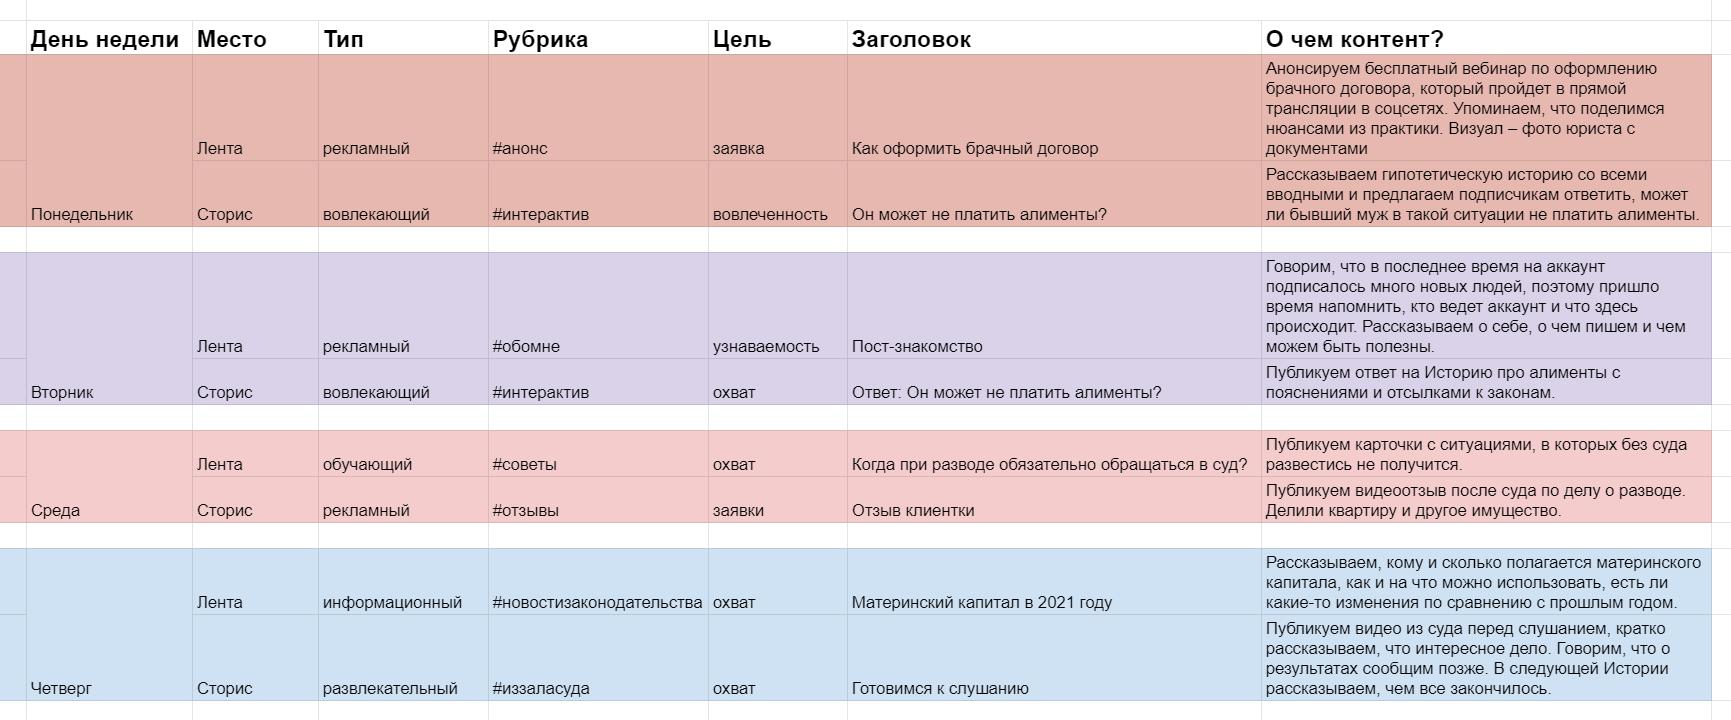 Шаблон матрицы контента для юриста в Гугл Таблицах